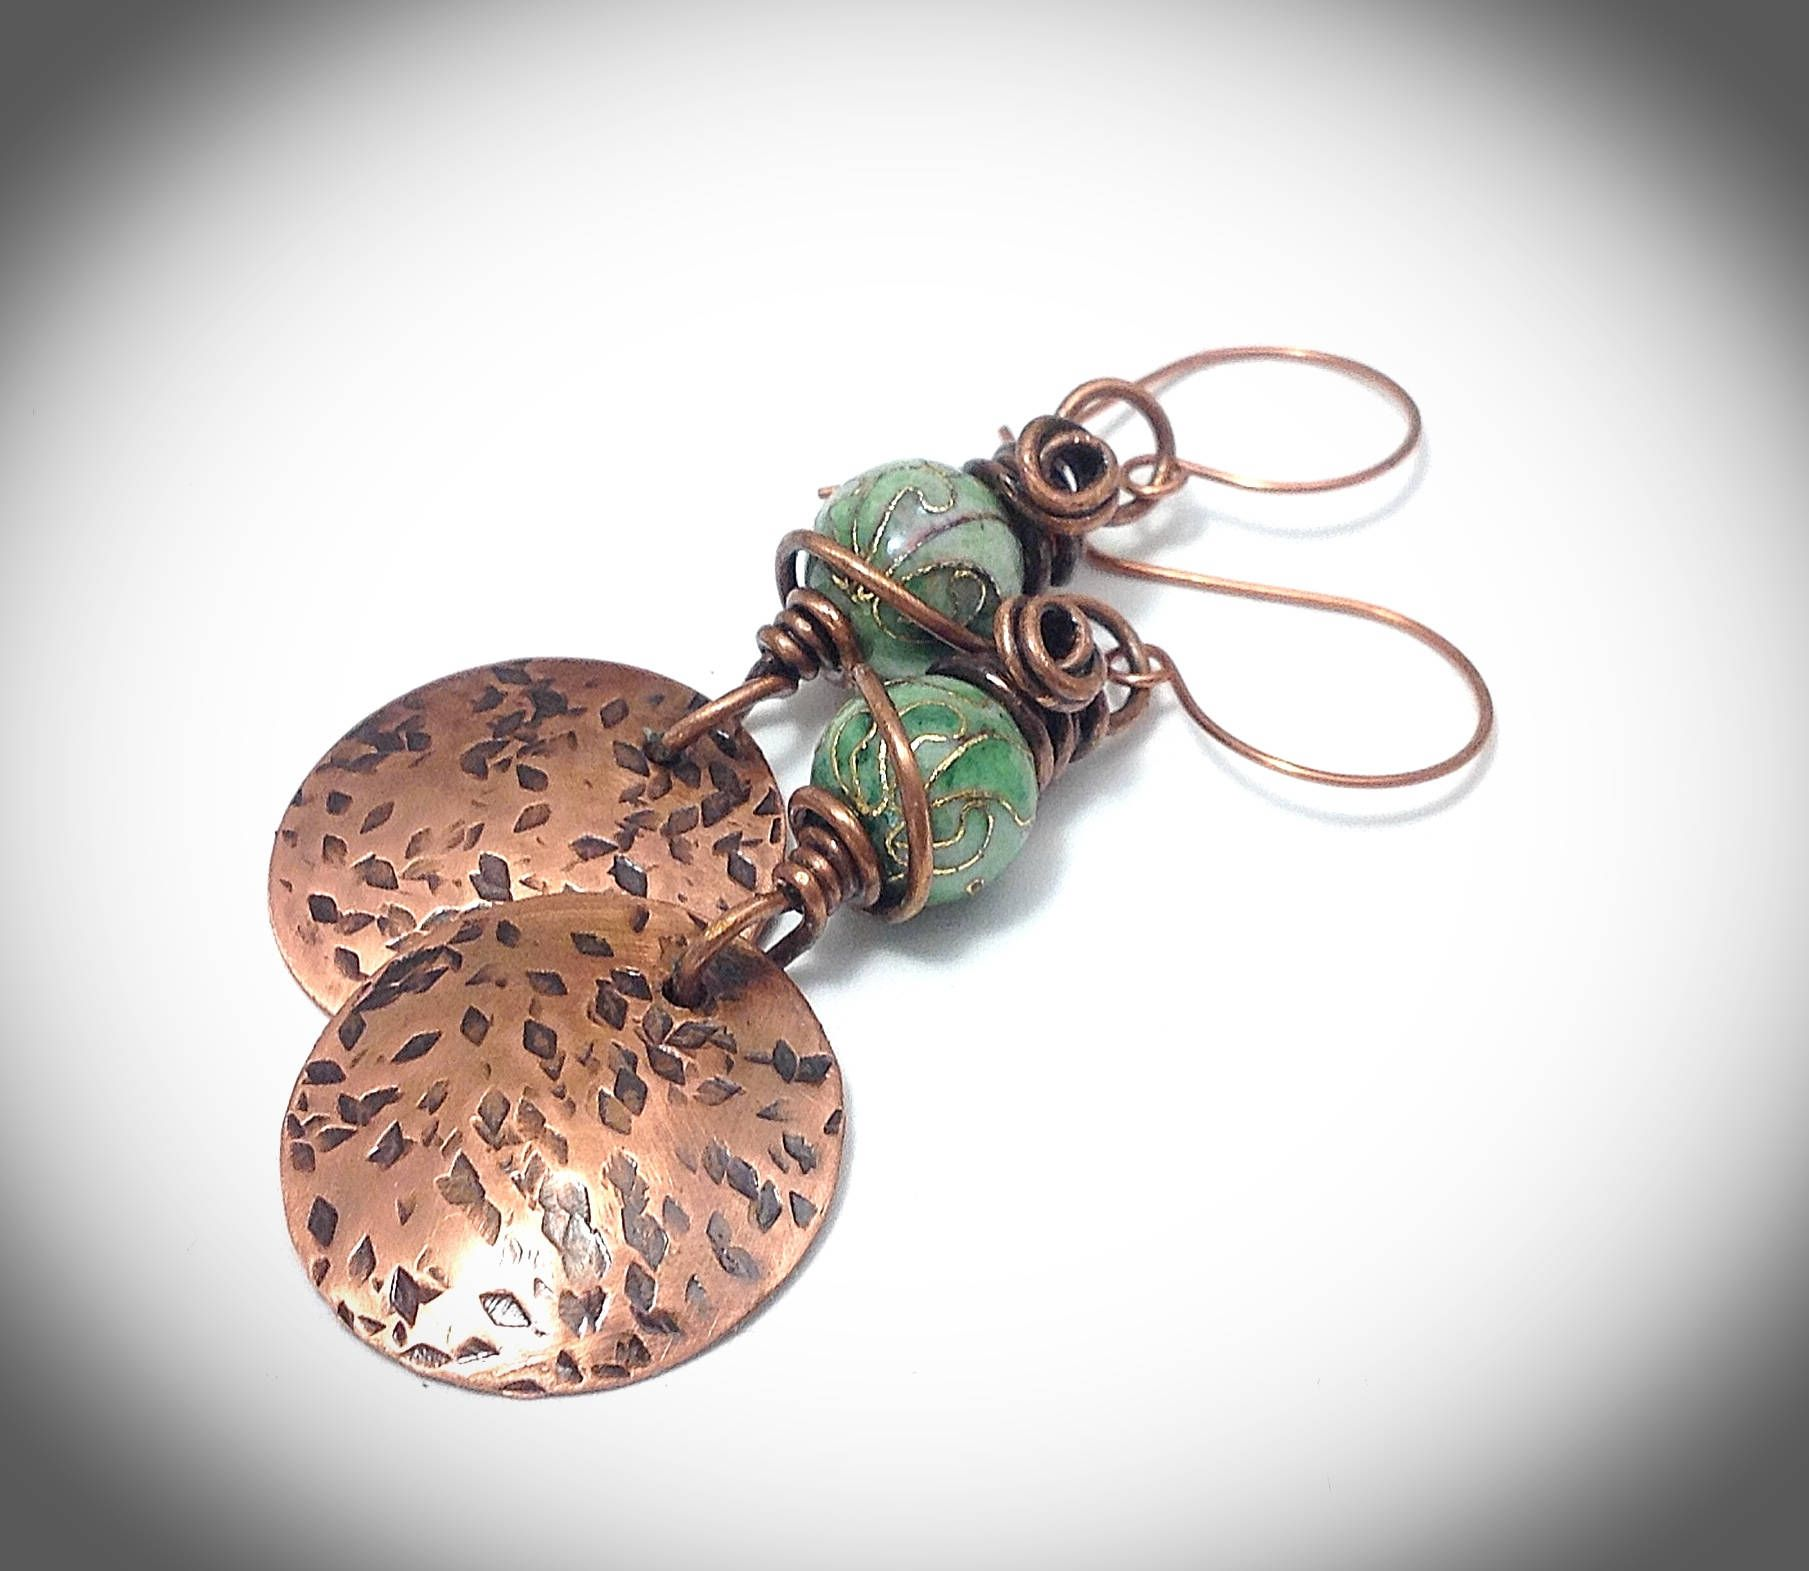 Wire earrings. Copper wire earrings. Cloisonne beads. Handcrafted ...